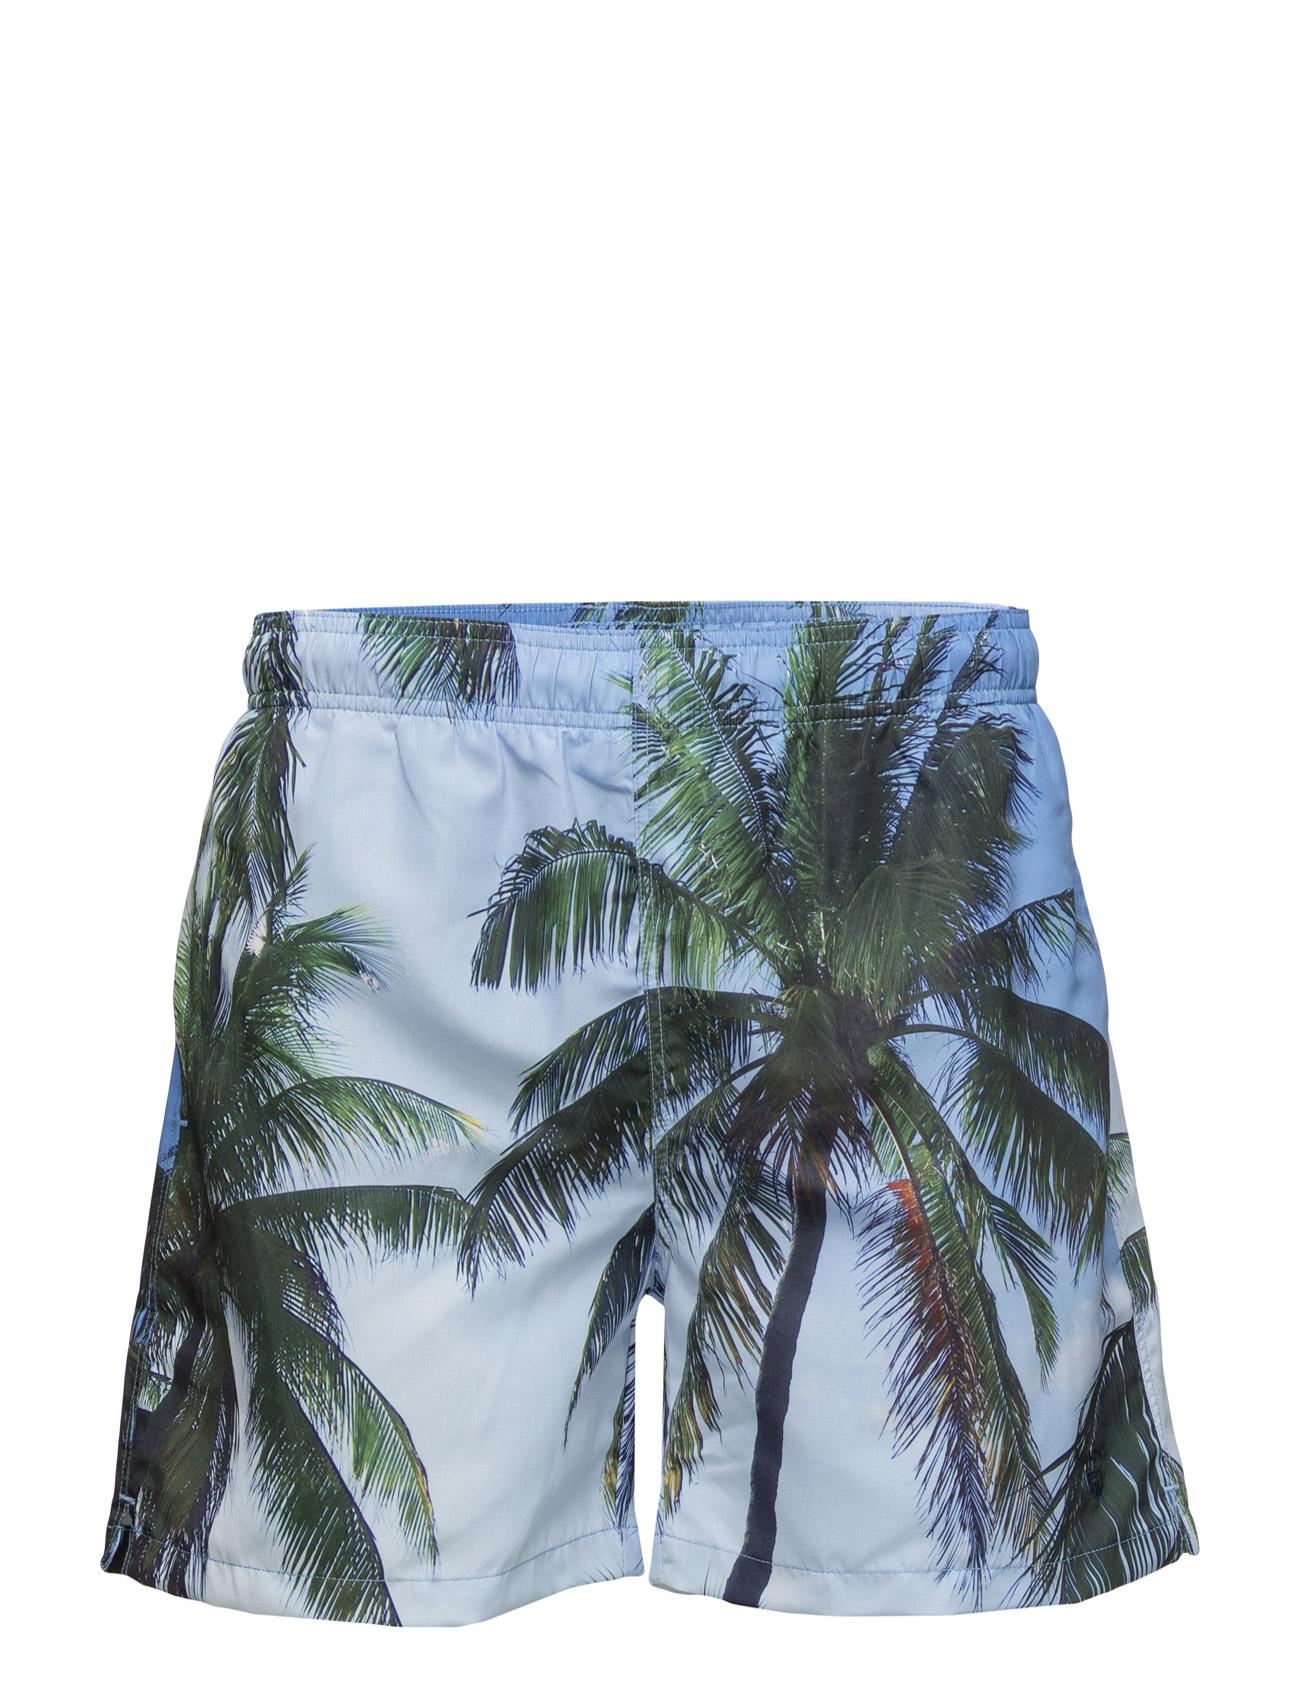 Palm Beach Digital Swim Shorts C.F GANT Shorts til Herrer i